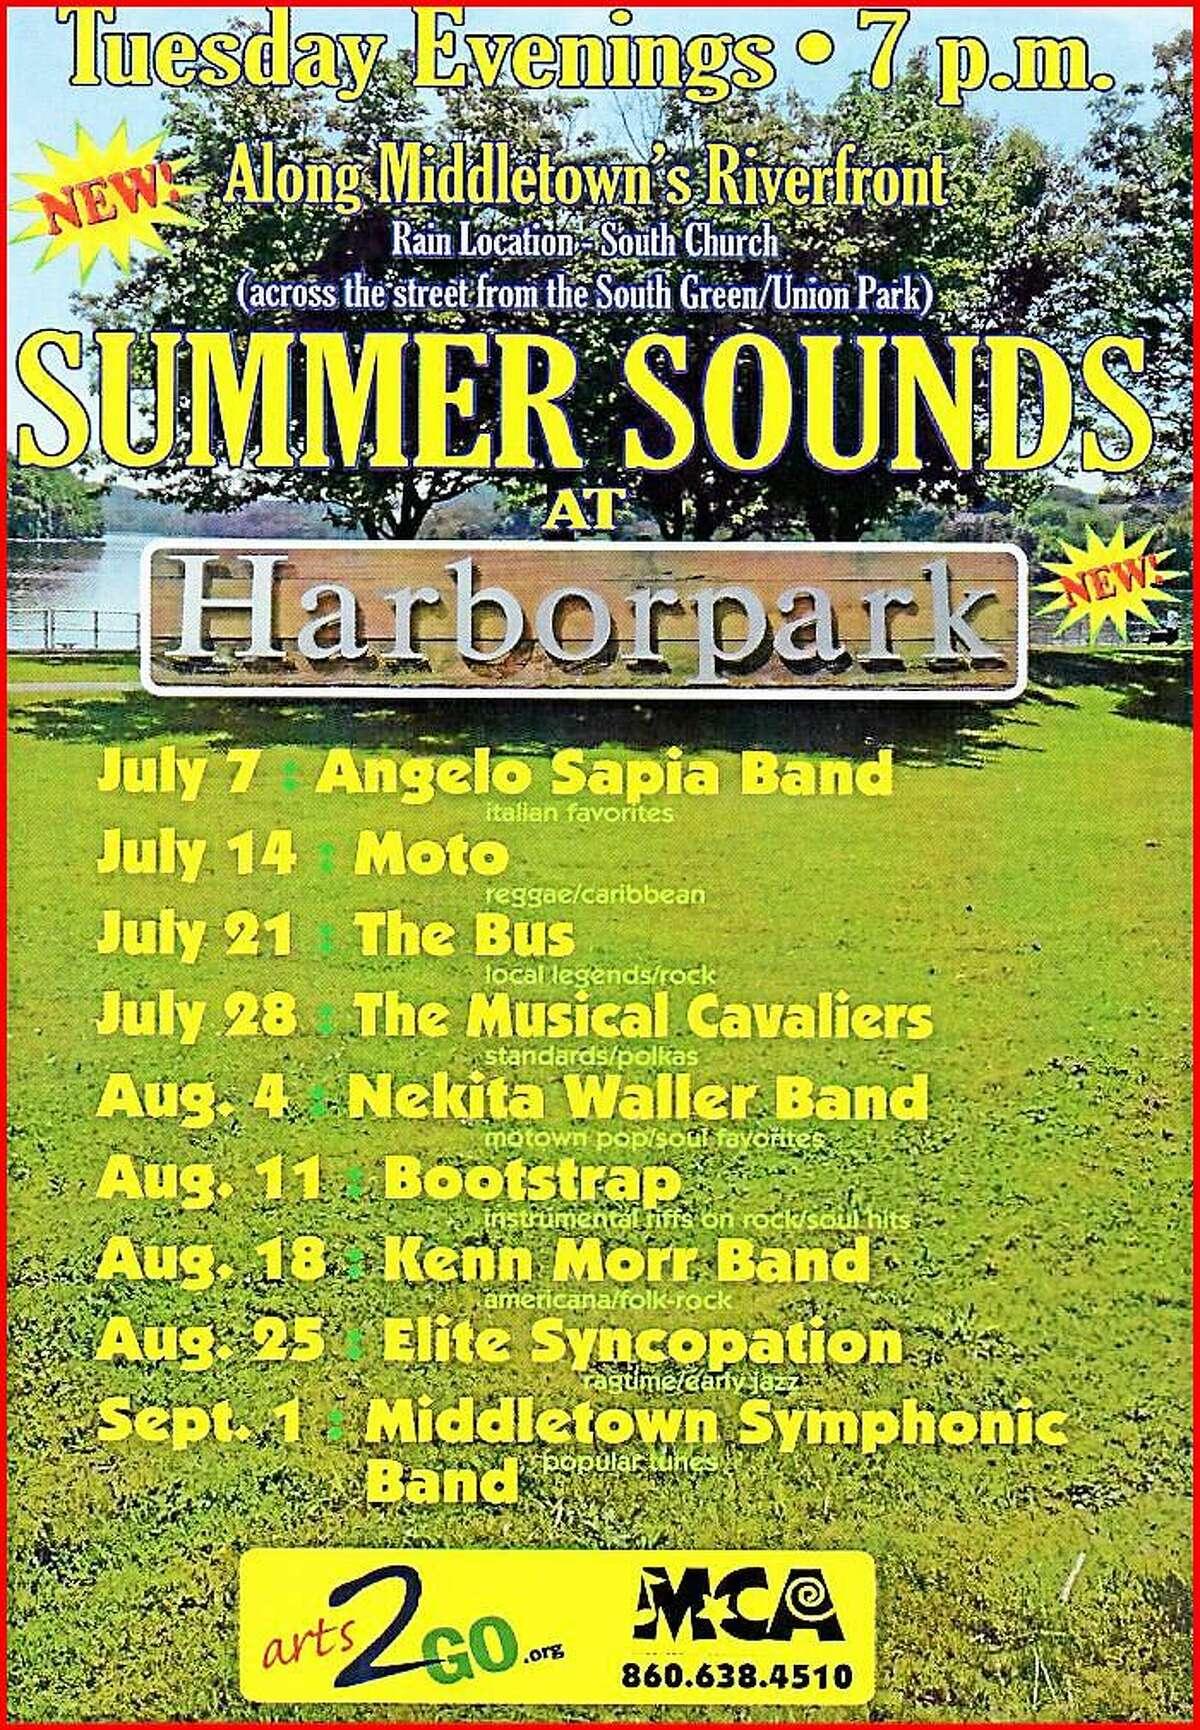 Summer Sounds Concerts begin in Middletown on July 7.